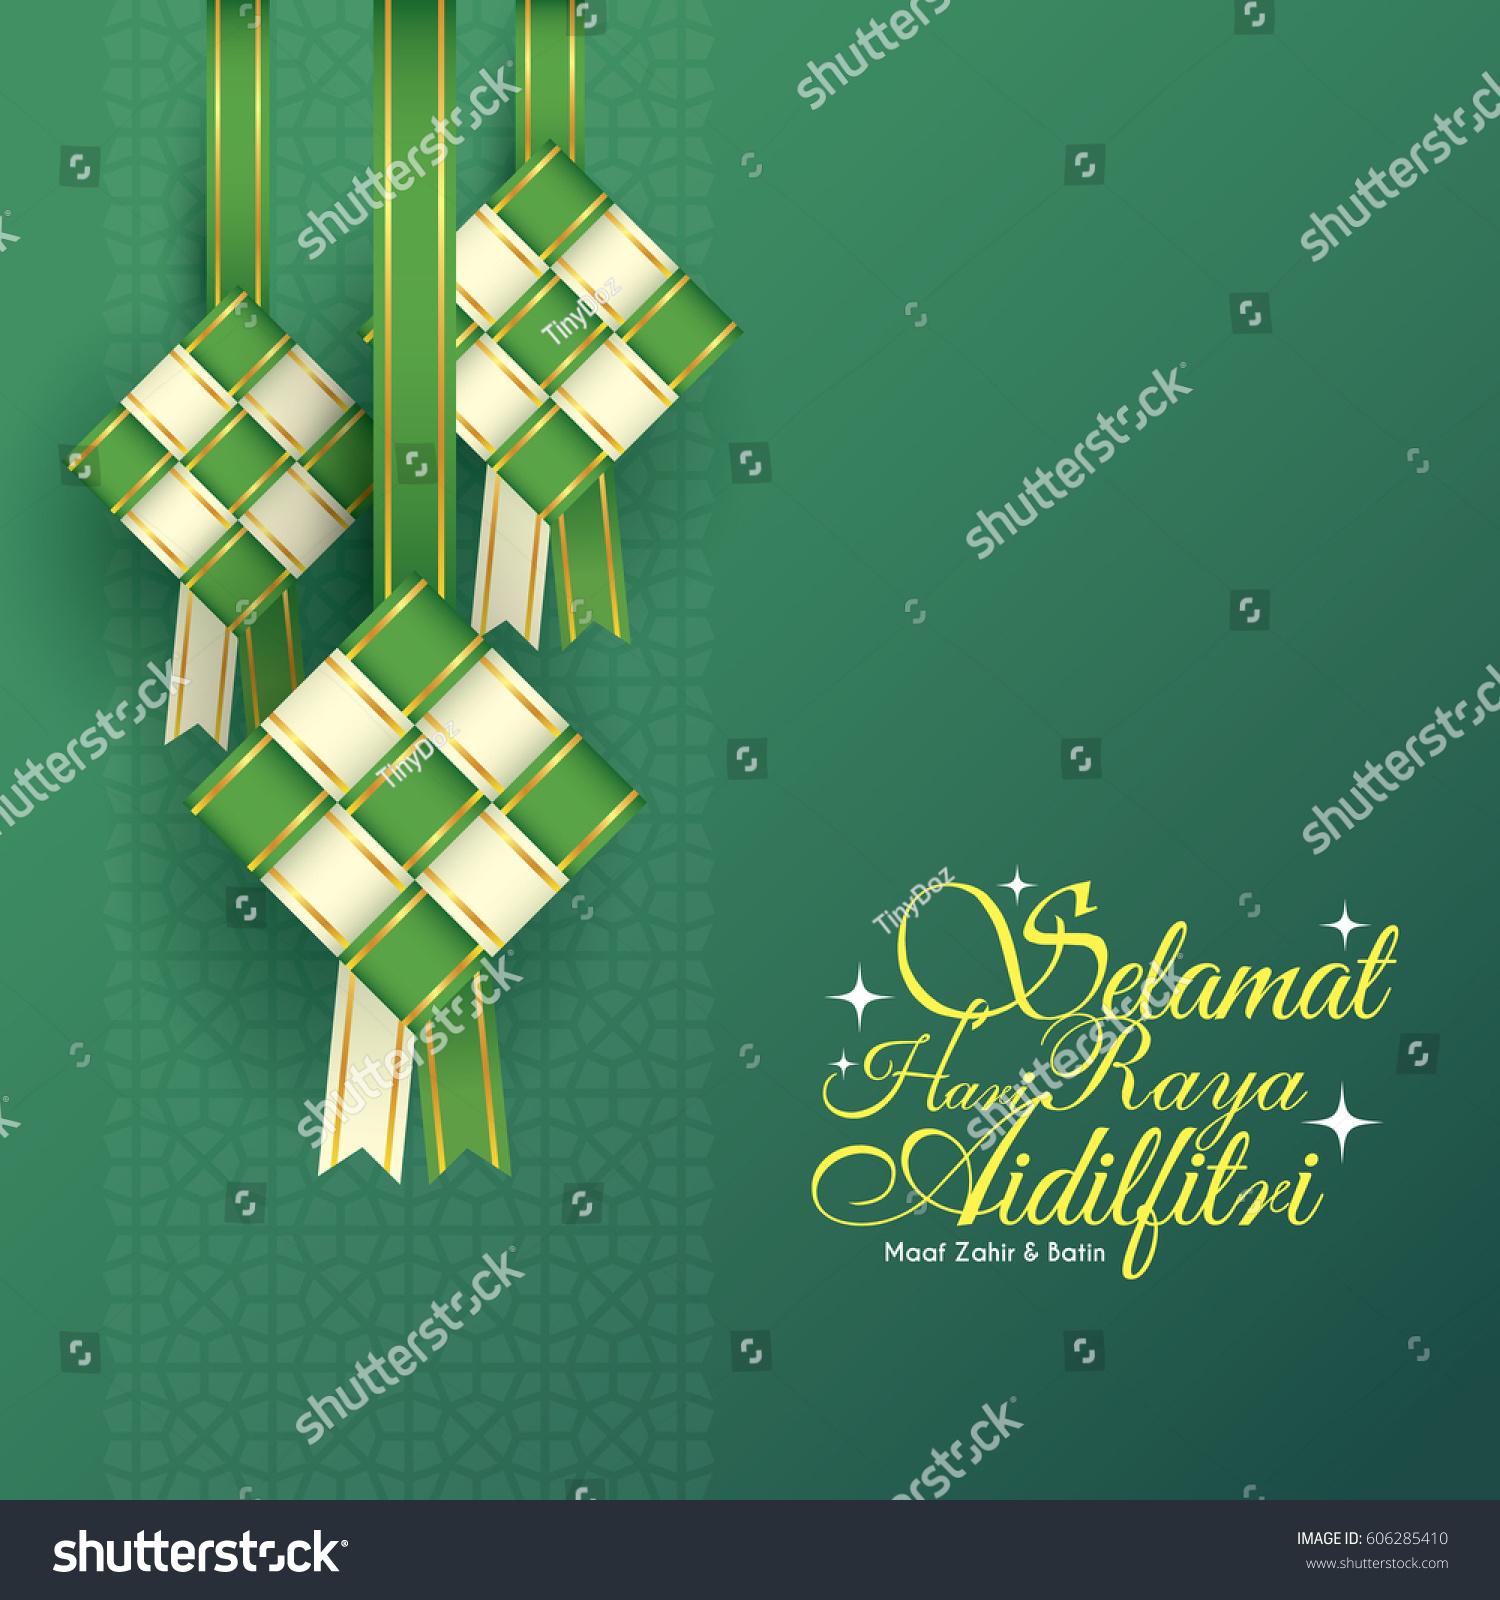 Selamat hari raya aidilfitri greeting card stock vector 606285410 selamat hari raya aidilfitri greeting card vector ketupat with islamic pattern as background kristyandbryce Image collections